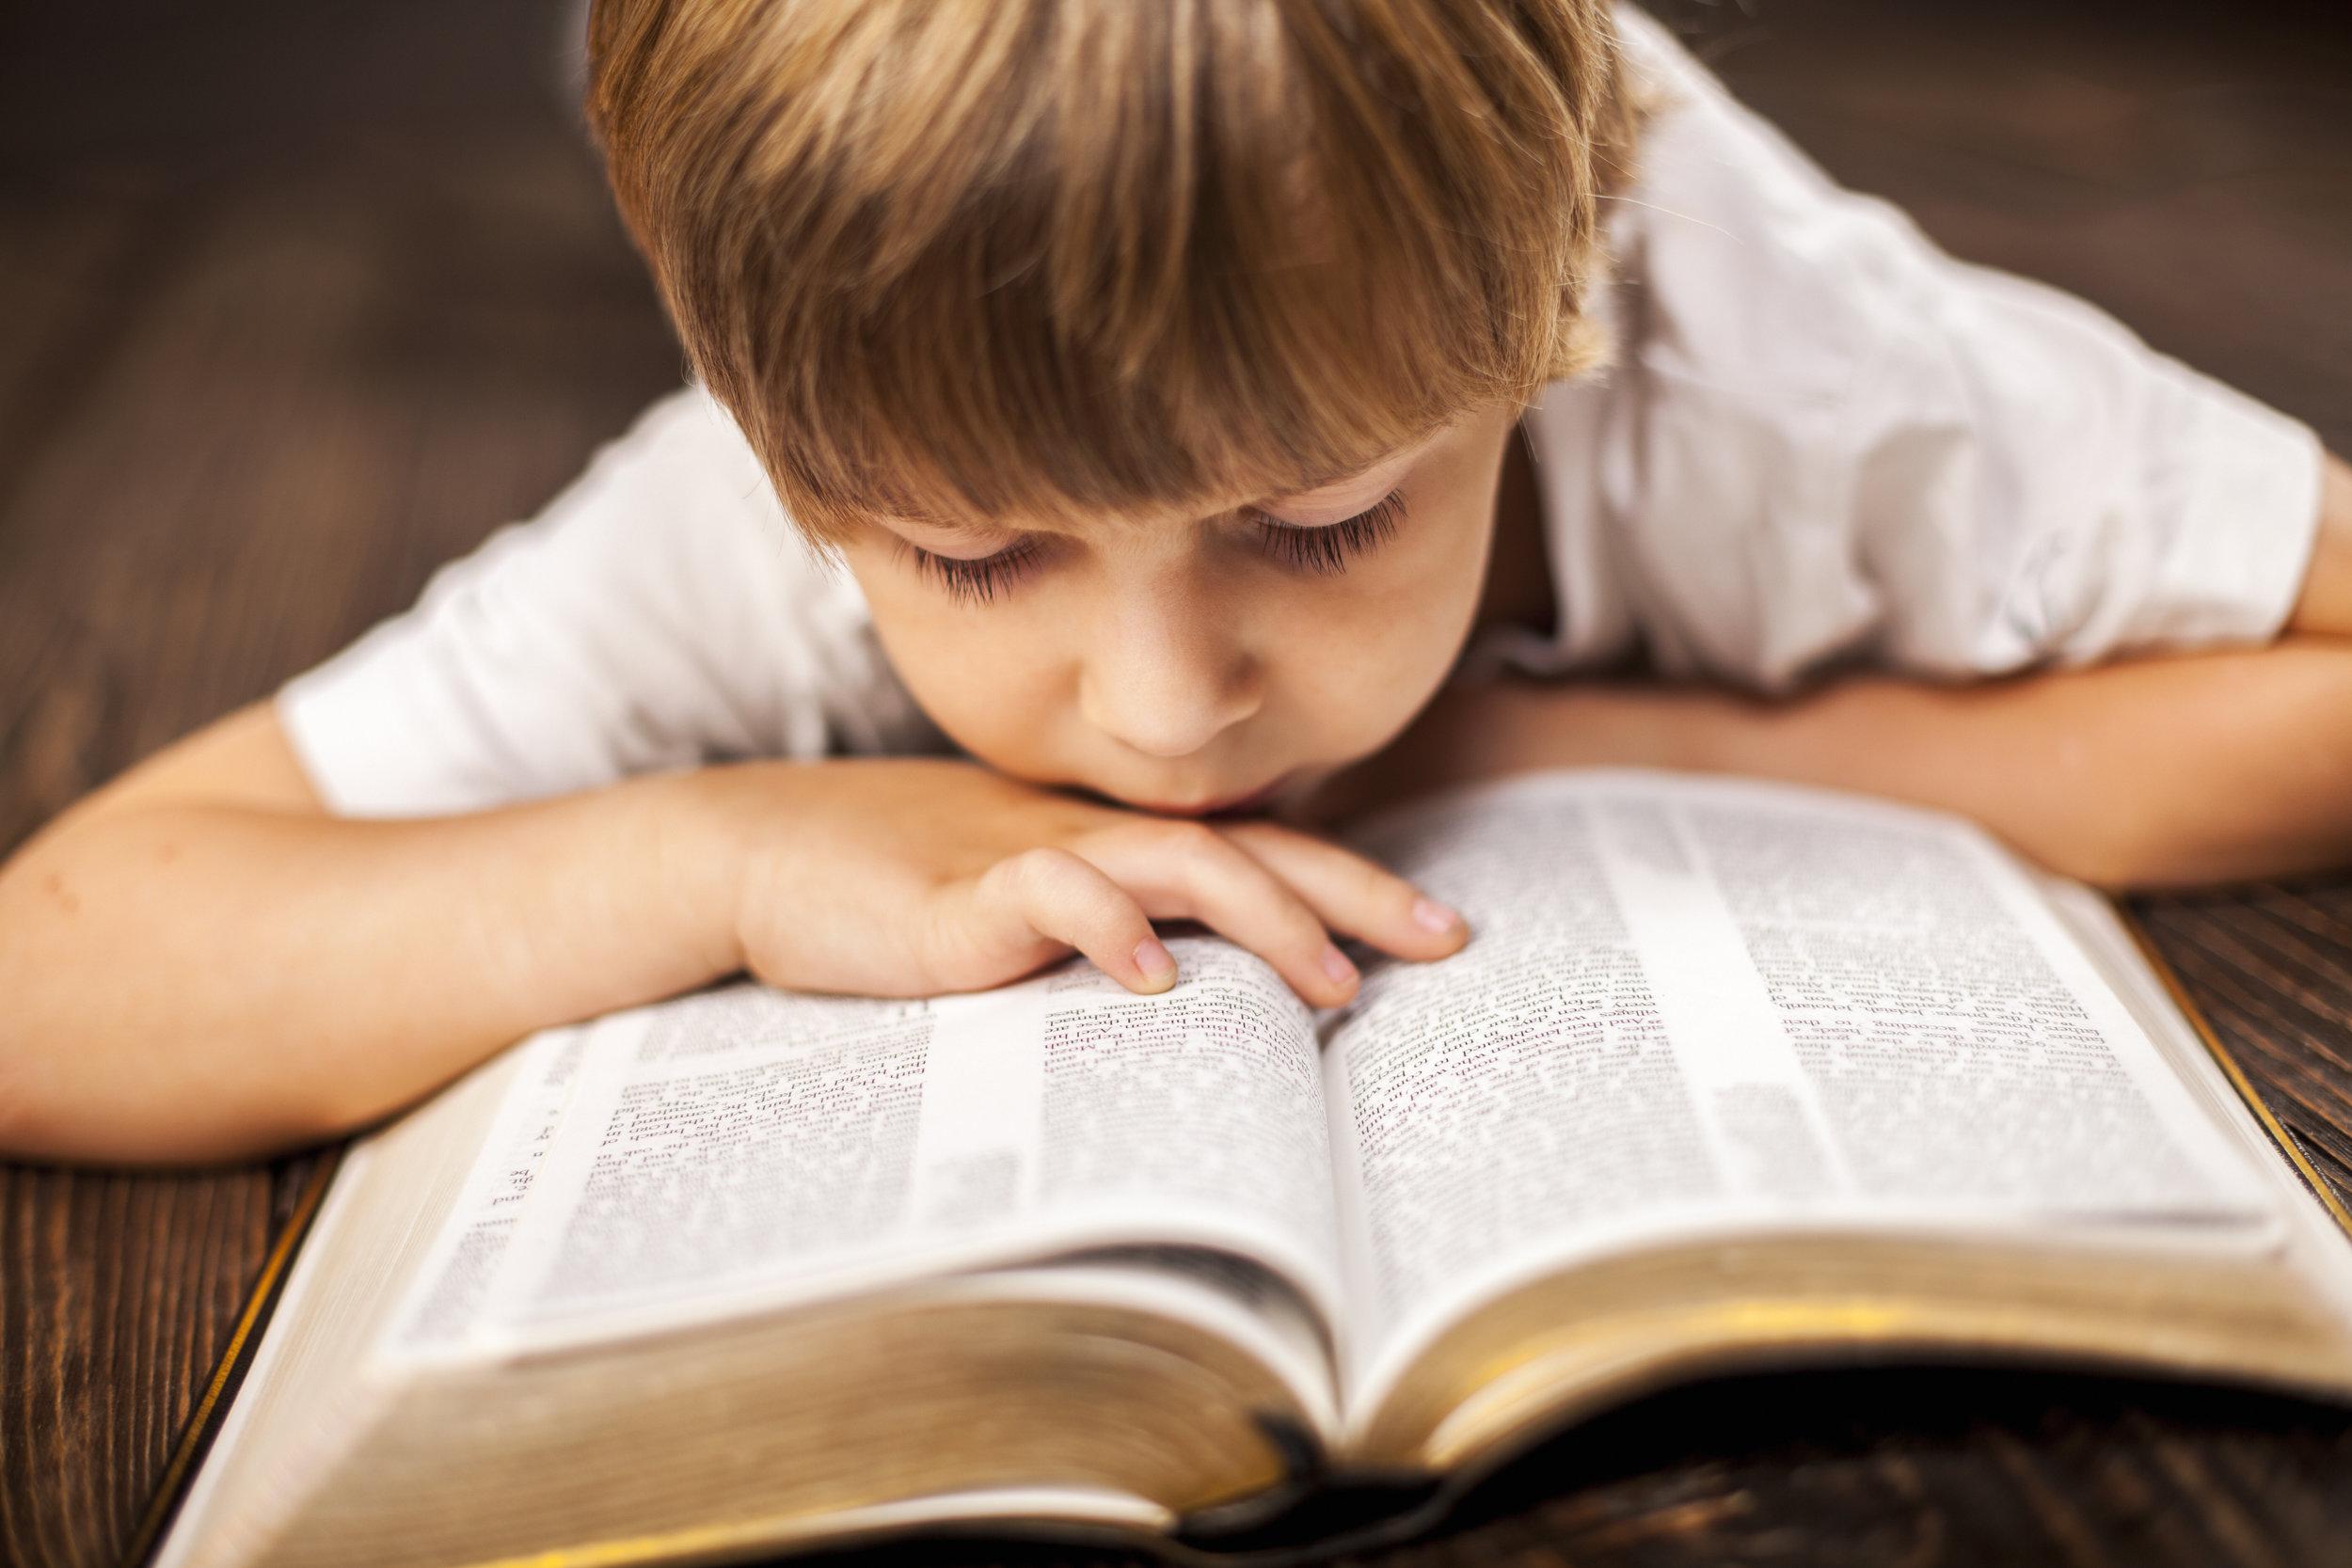 bigstock-little-boy-studying-the-script-80780252.jpg